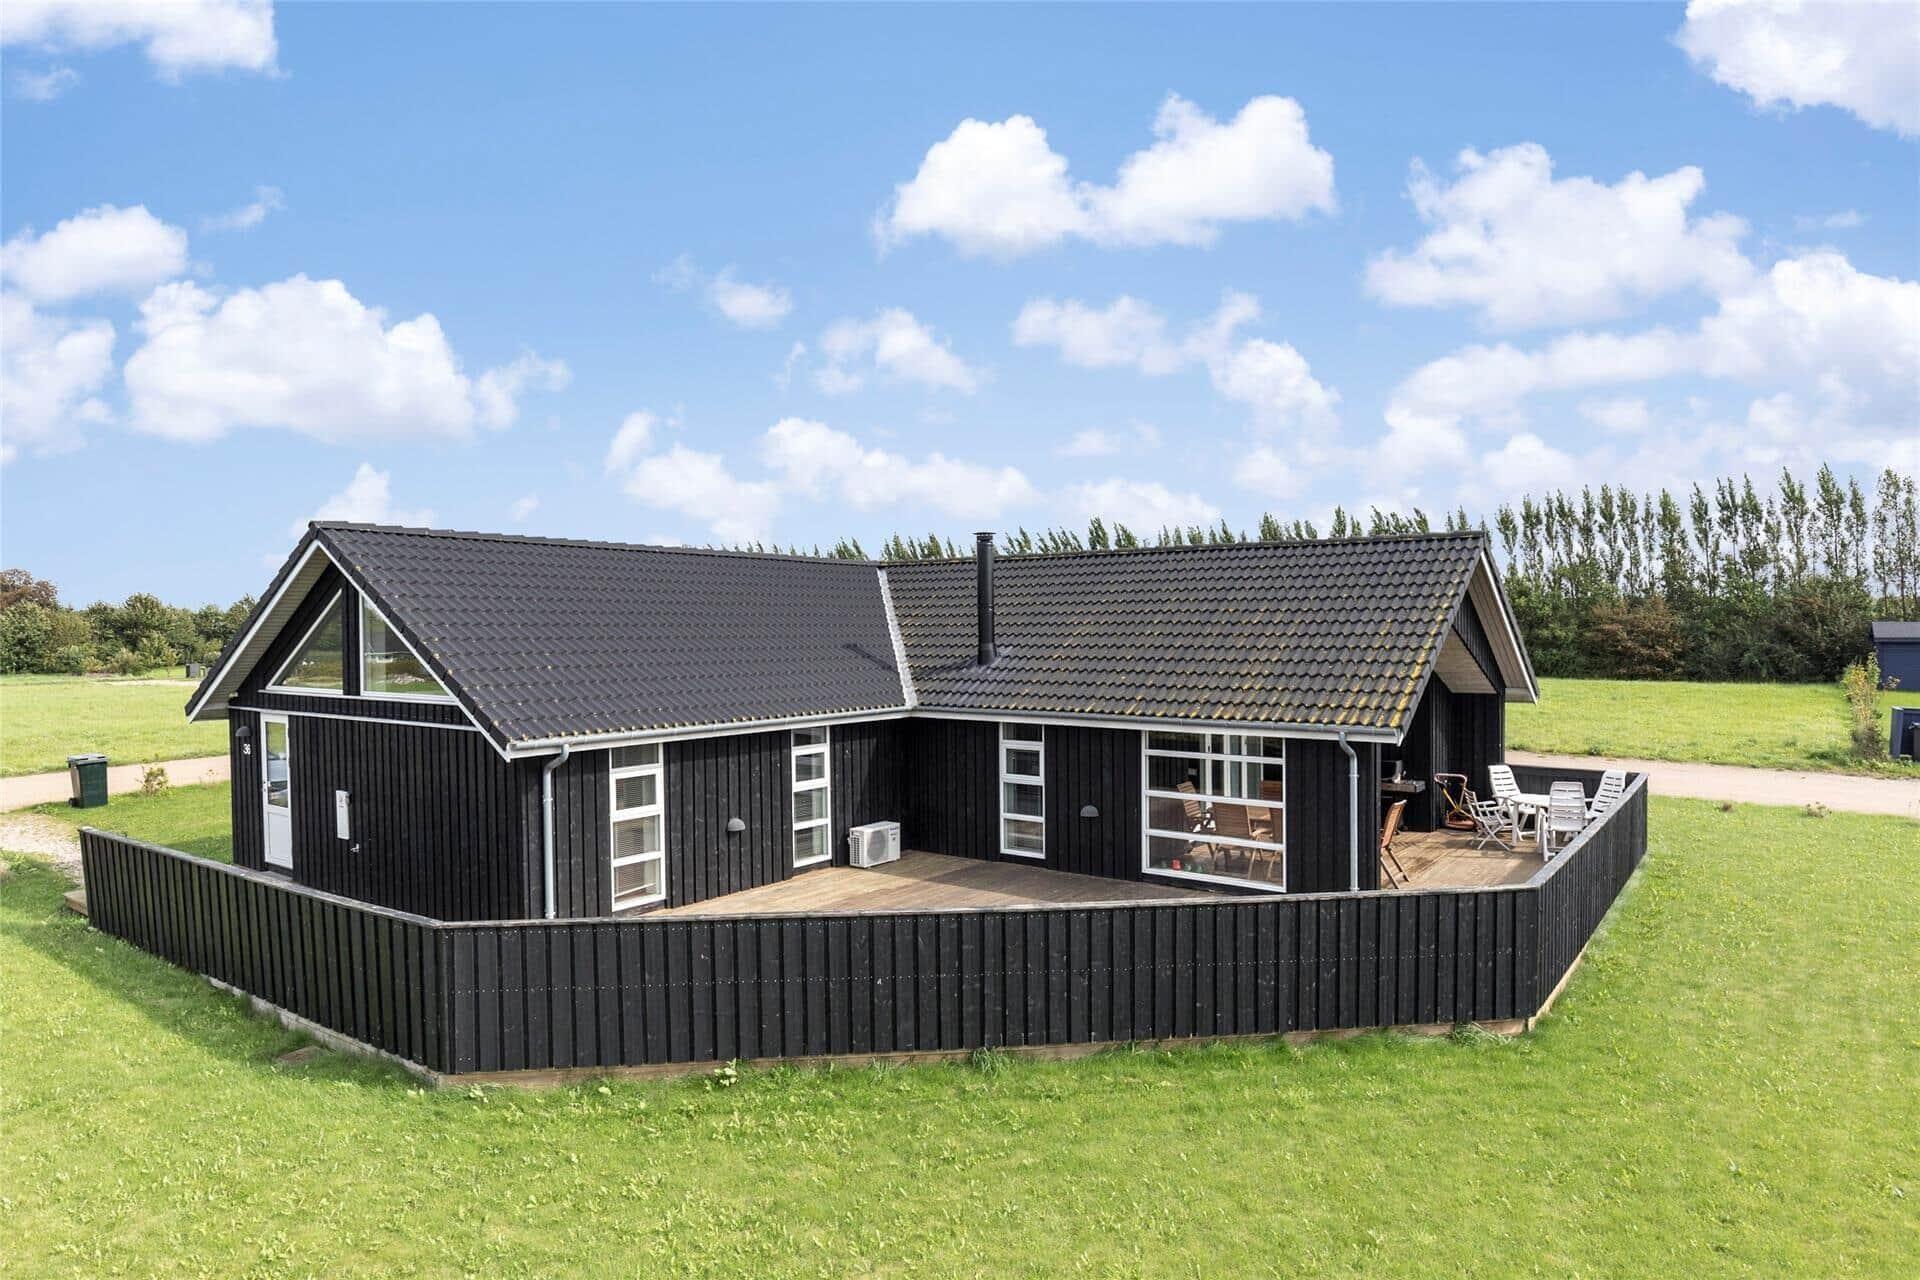 Bild 1-17 Ferienhaus 17702, Strandlunden 36, DK - 4534 Hørve